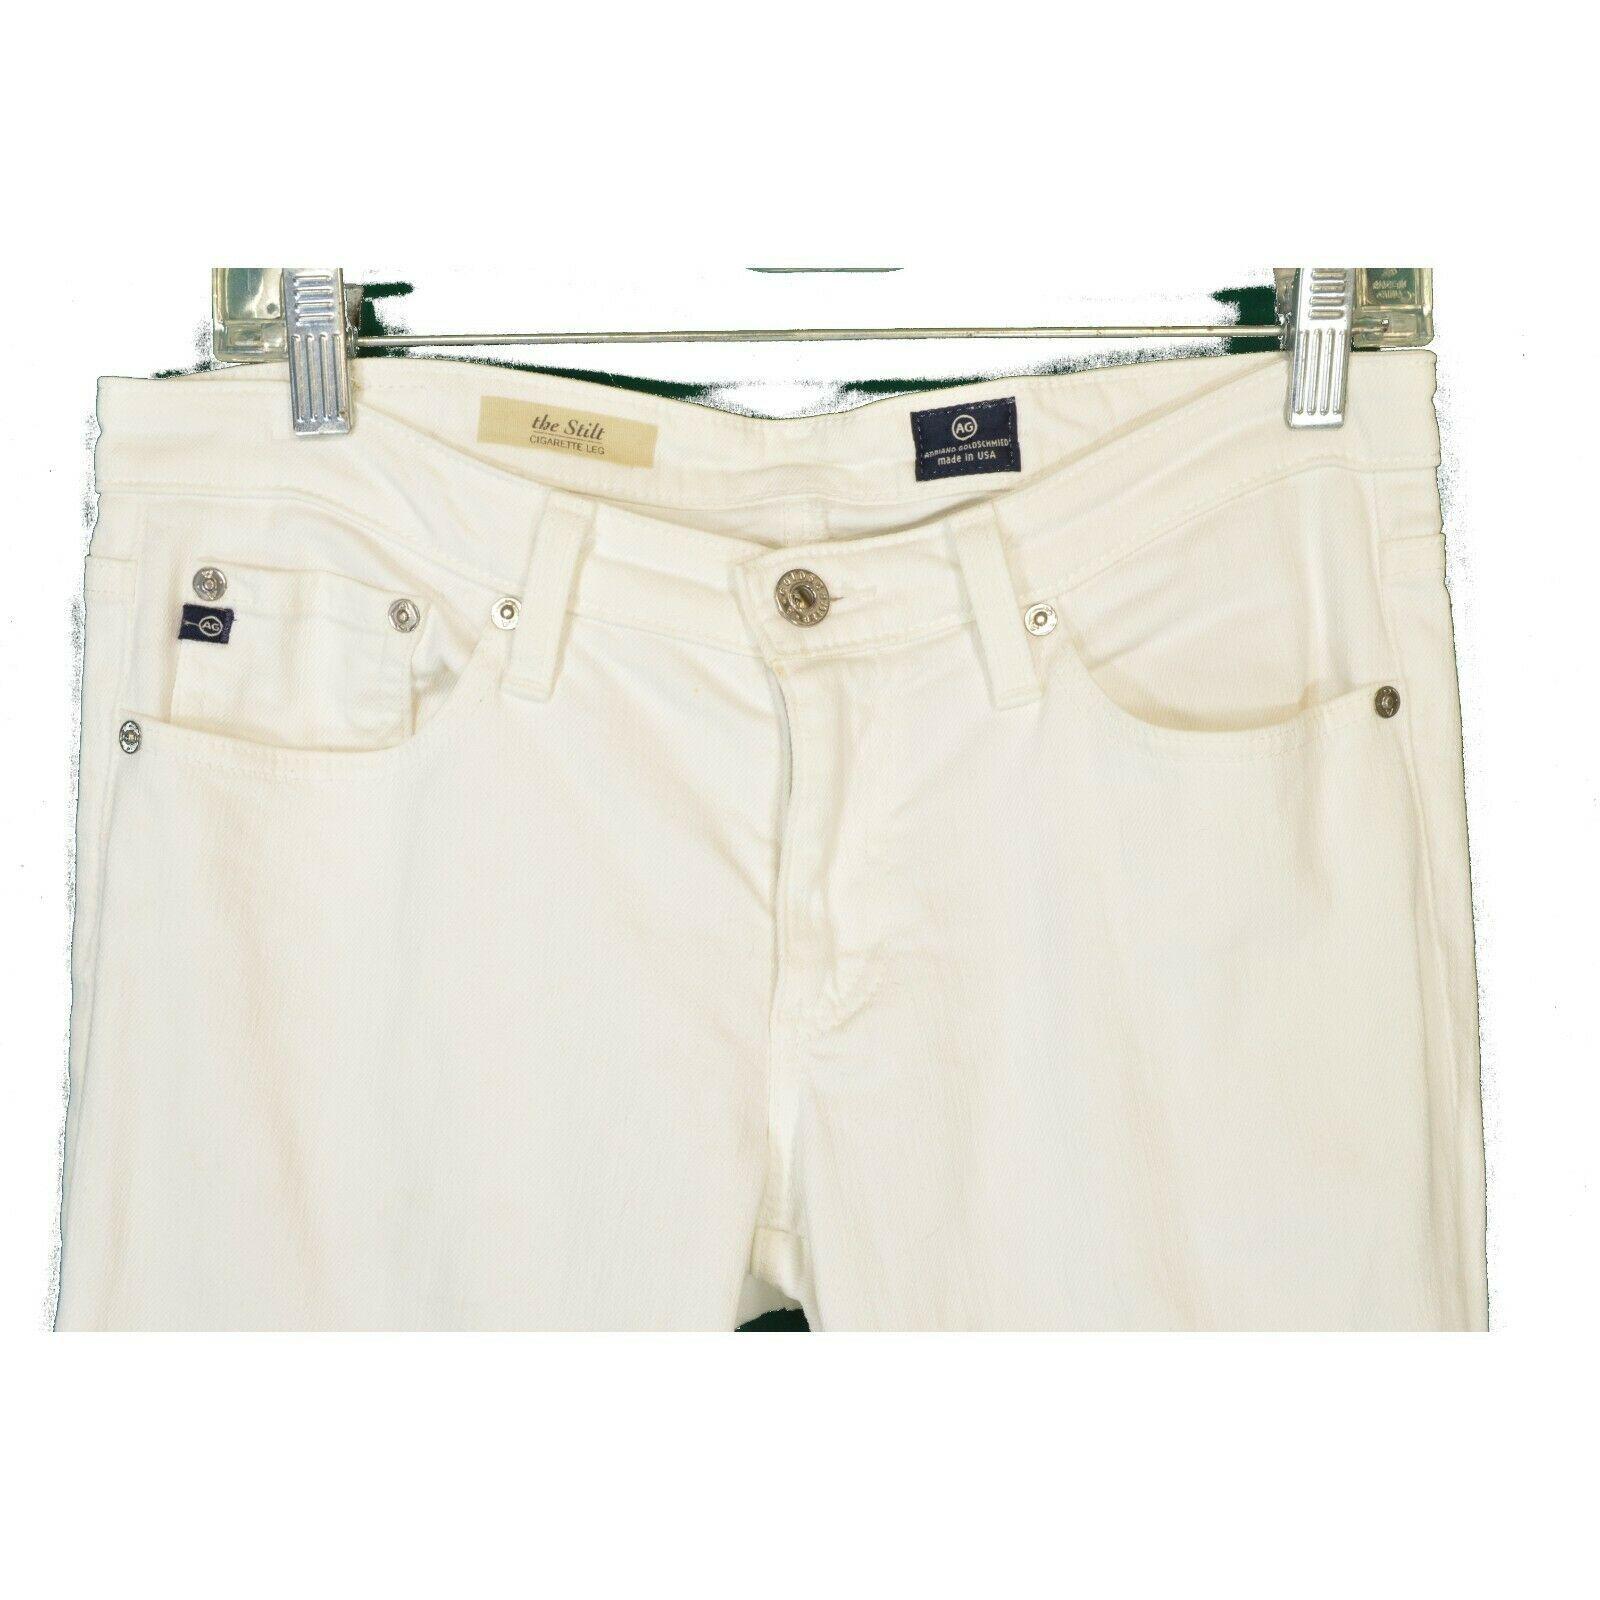 AG Adriano Goldschmied jeans 29 x 31 Stilt cigarette leg White thick EUCUSA image 3